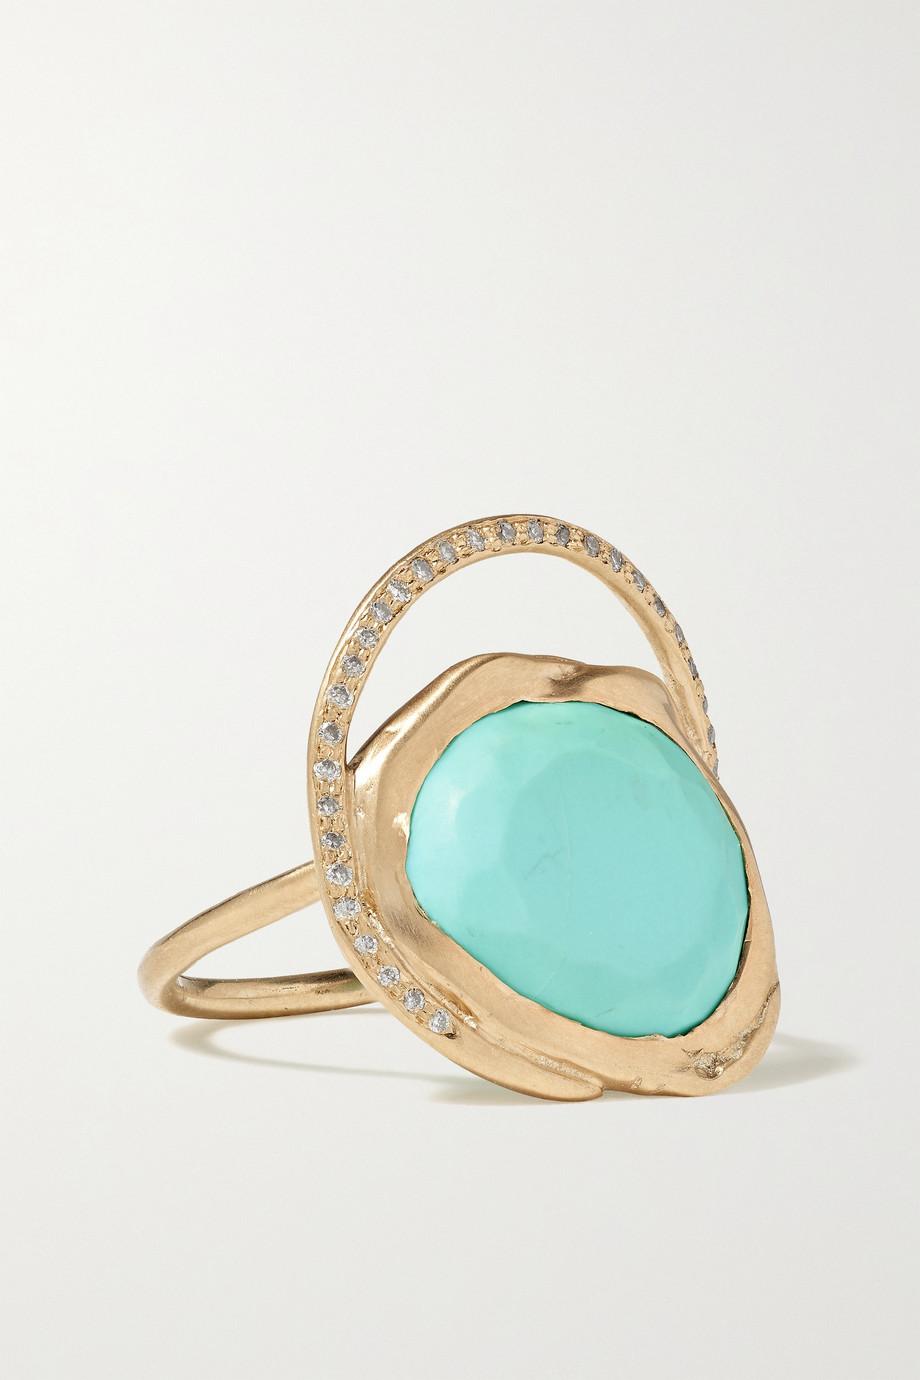 Pascale Monvoisin Gaia 9-karat gold, turquoise and diamond ring